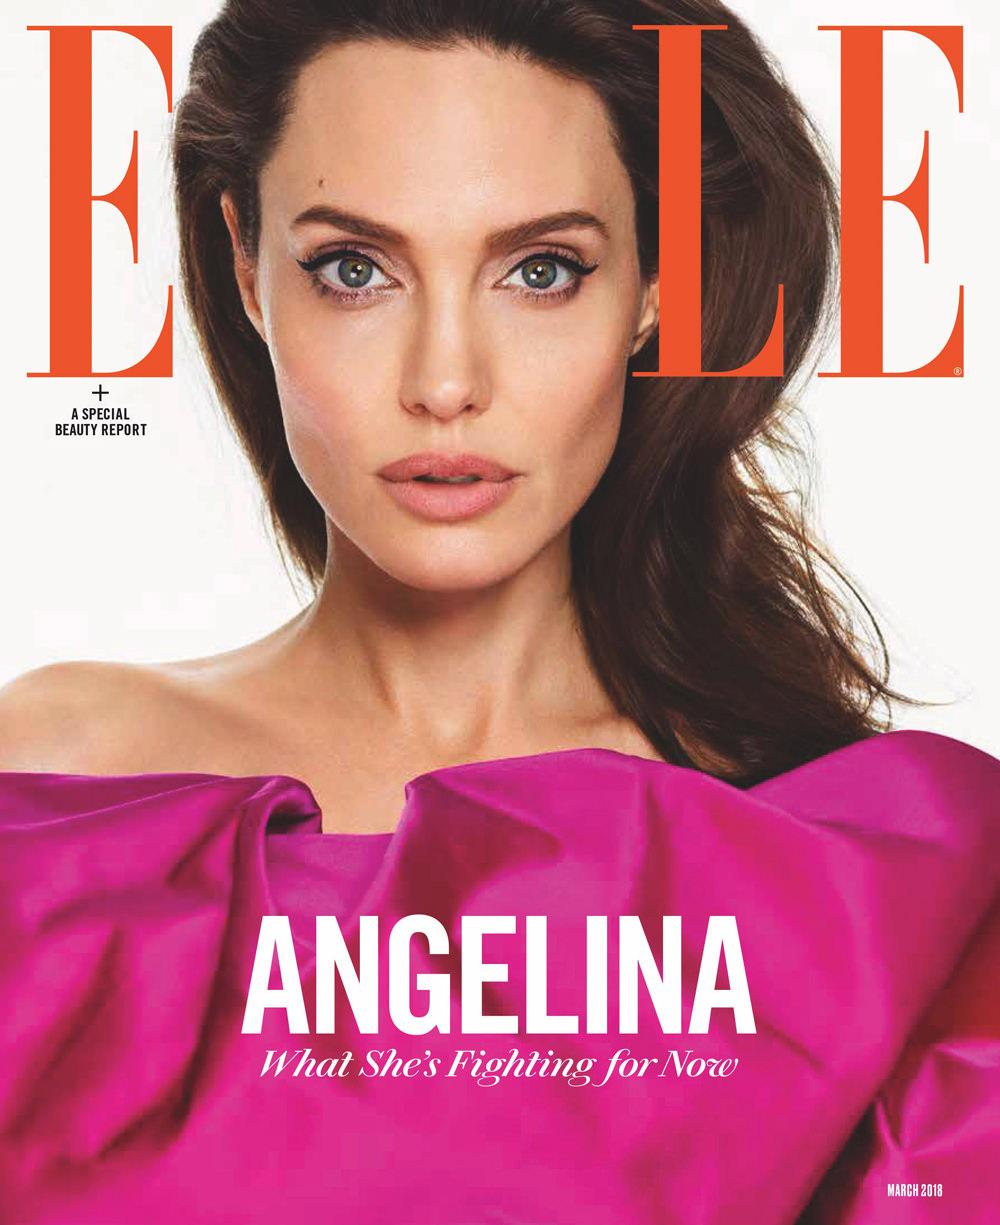 Paparazzi Angelina McCoy nude photos 2019